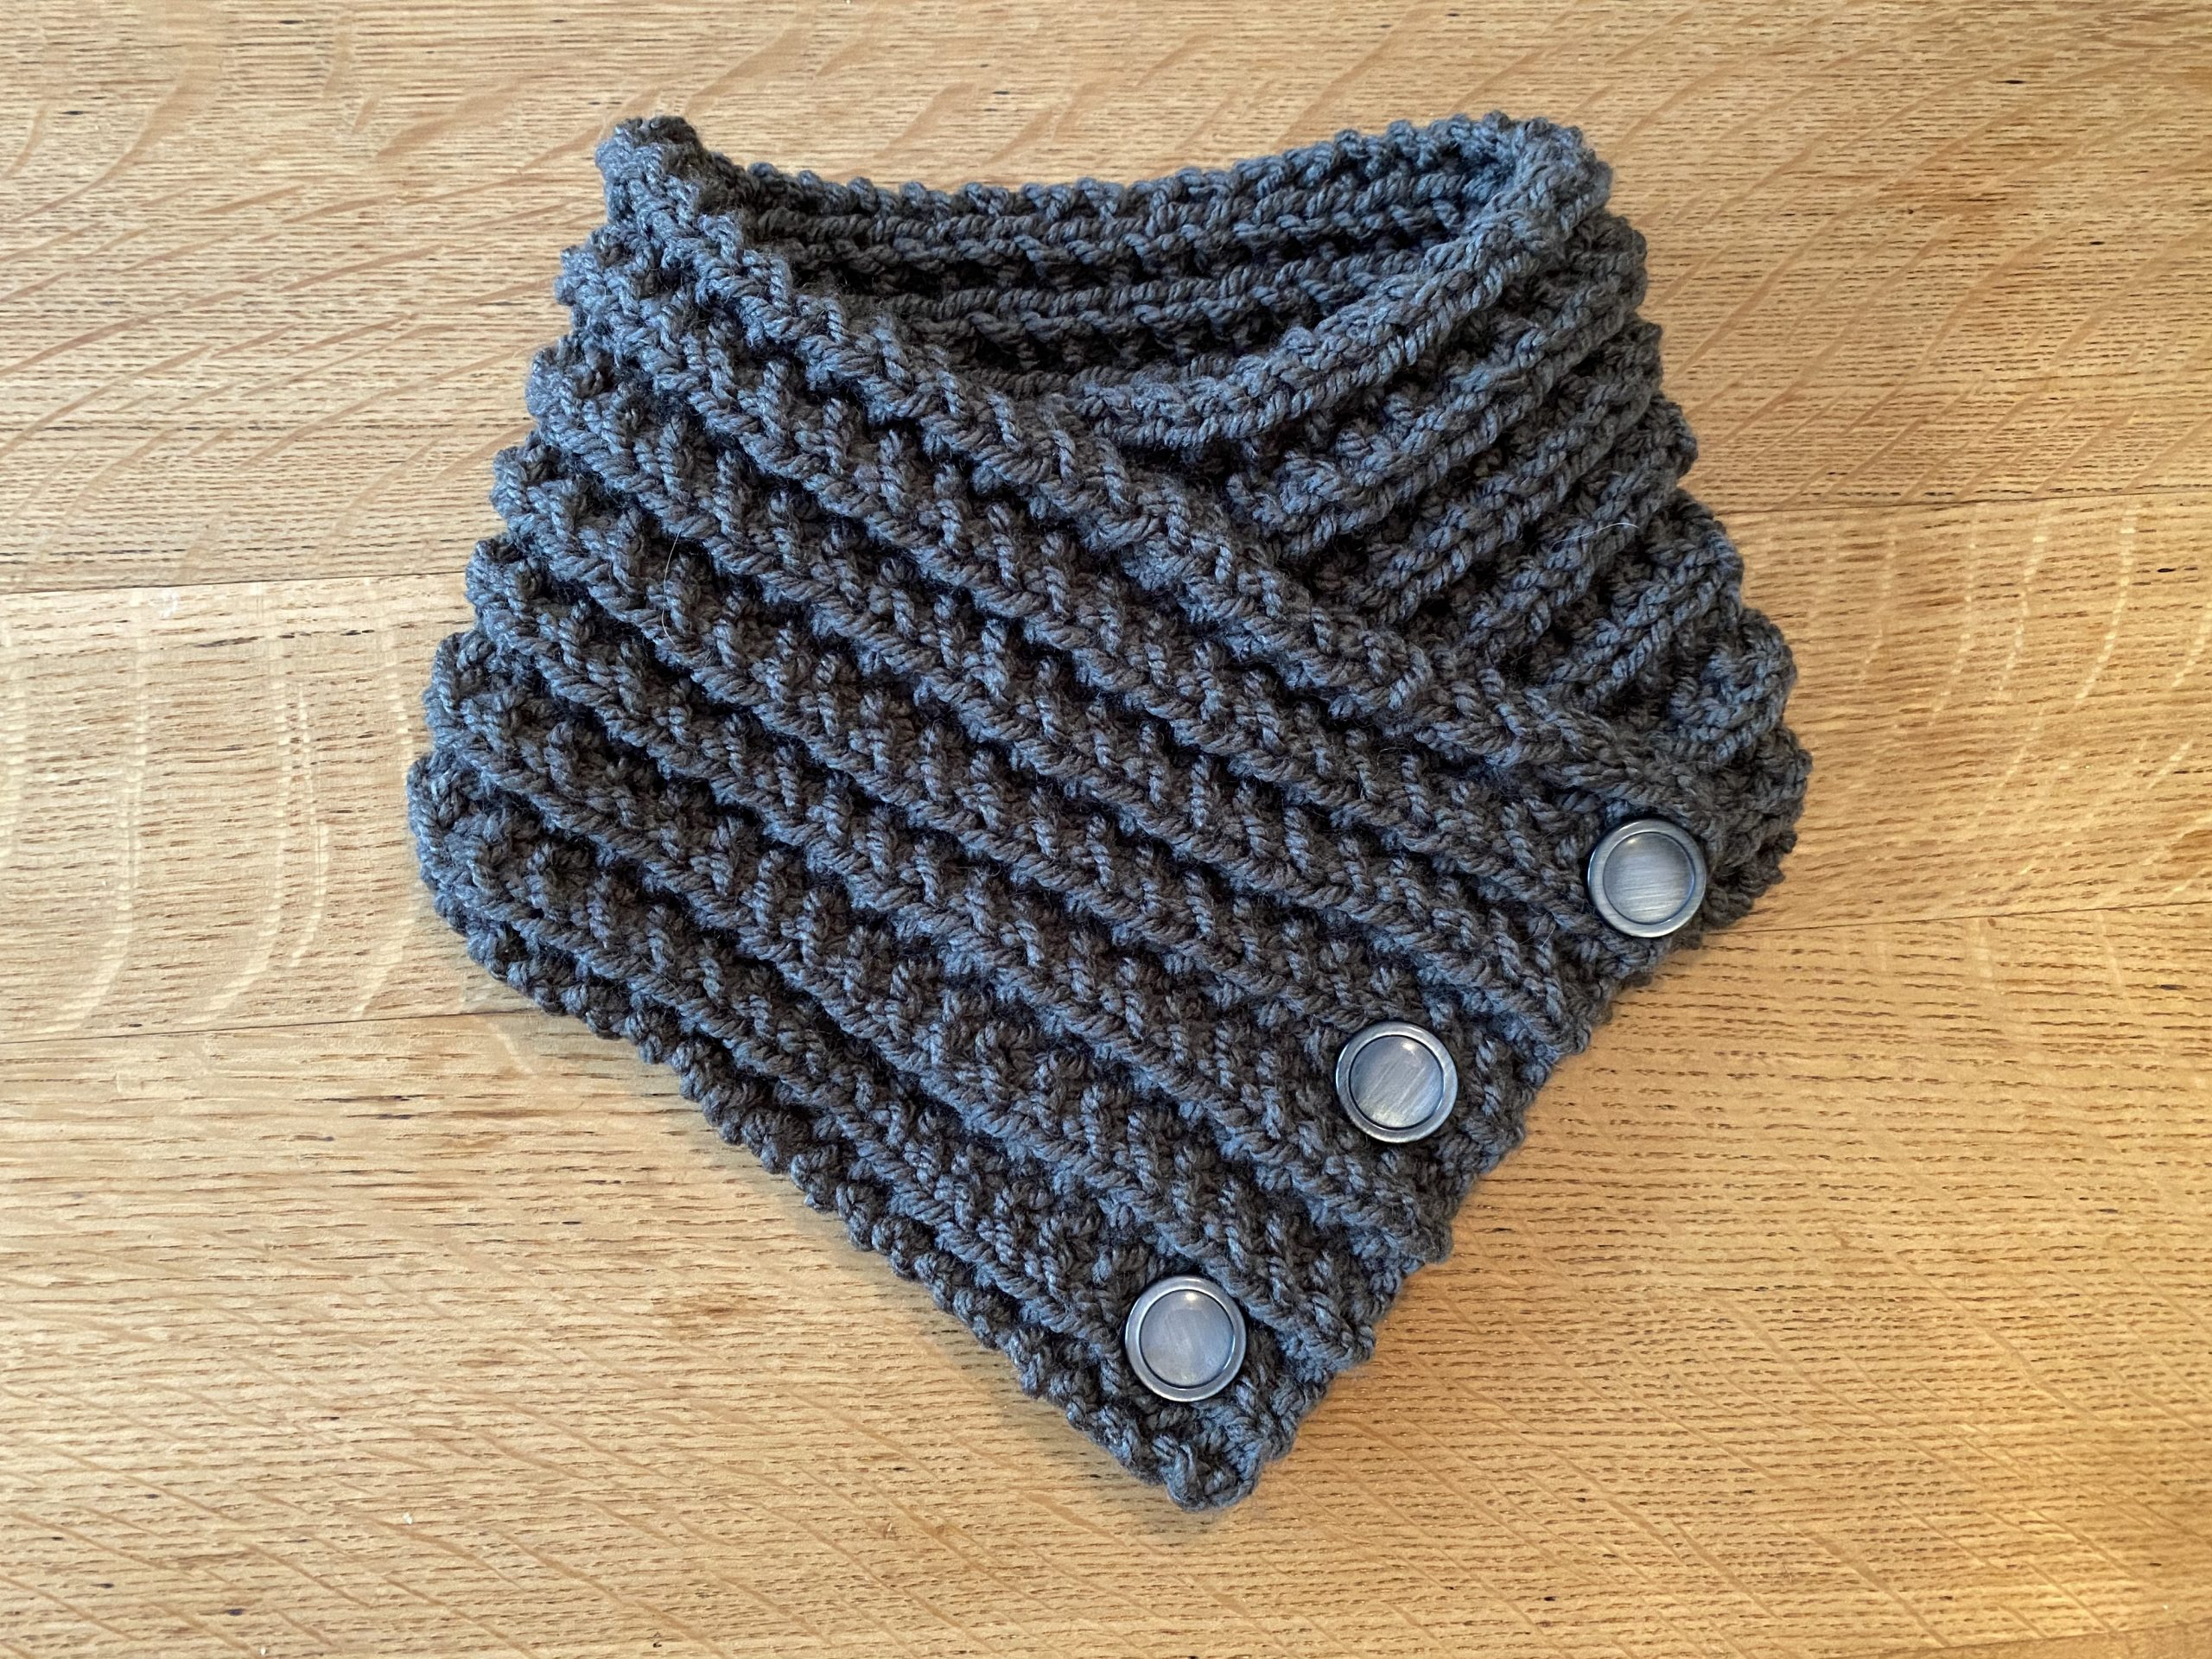 Free Knitting Pattern: 3 Button Neckwarmer